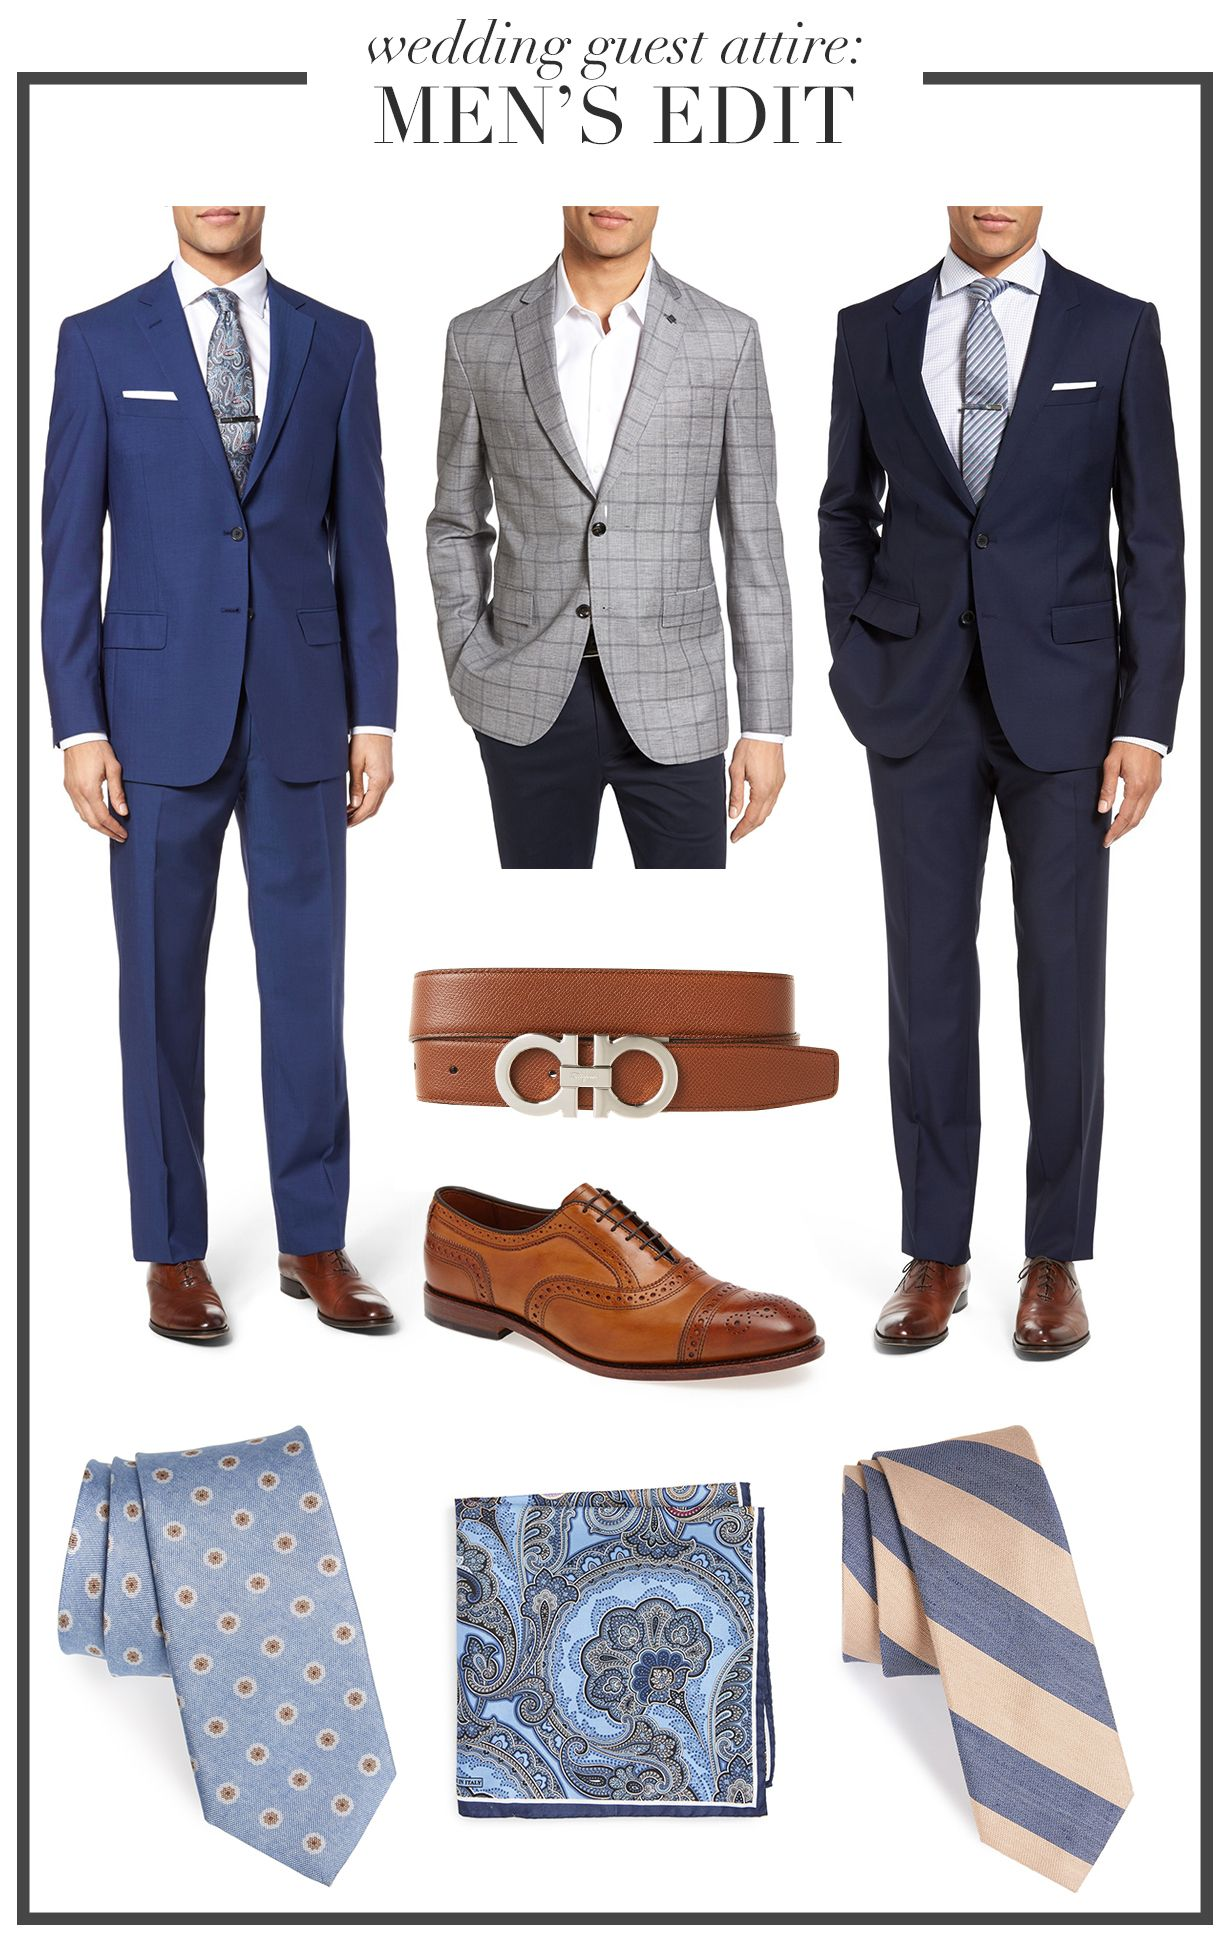 f3deb1463711d Wedding Wednesday: Men's Edit, What to wear to weddings, wedding attire  etiquette, men's wear